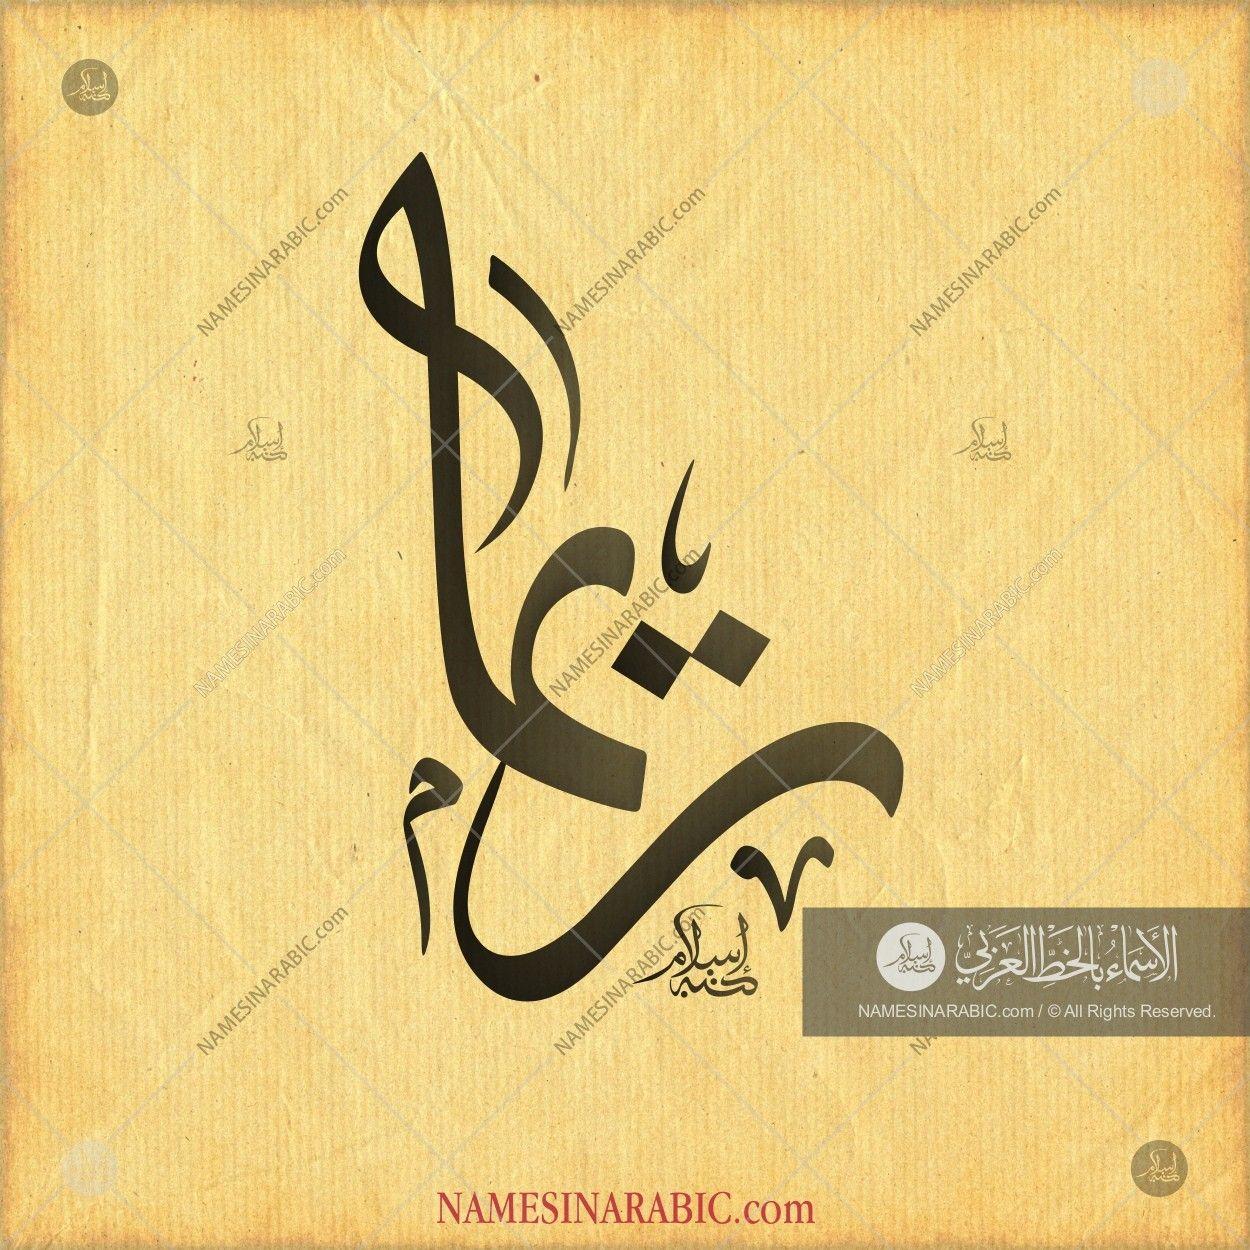 Reema ريما Names In Arabic Calligraphy Name 4519 Arabic Calligraphy Design Calligraphy Name Calligraphy